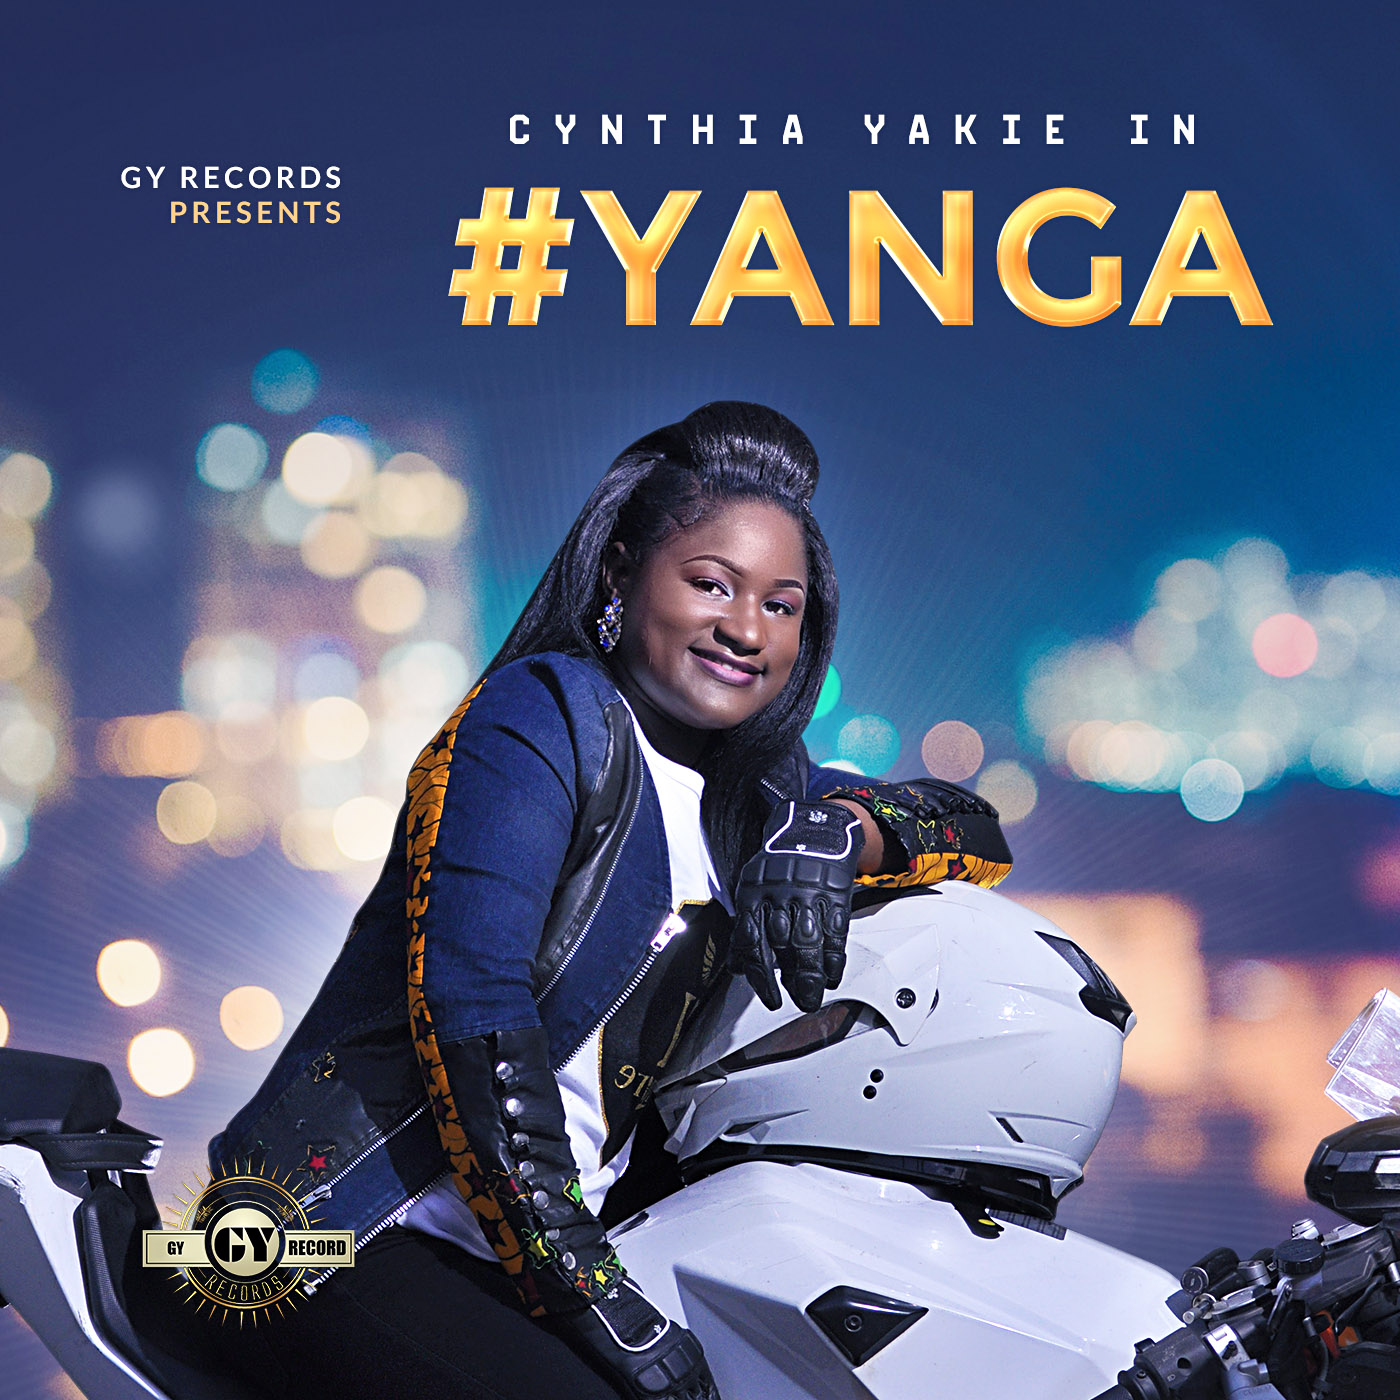 Cynthia Yakie - Yanga